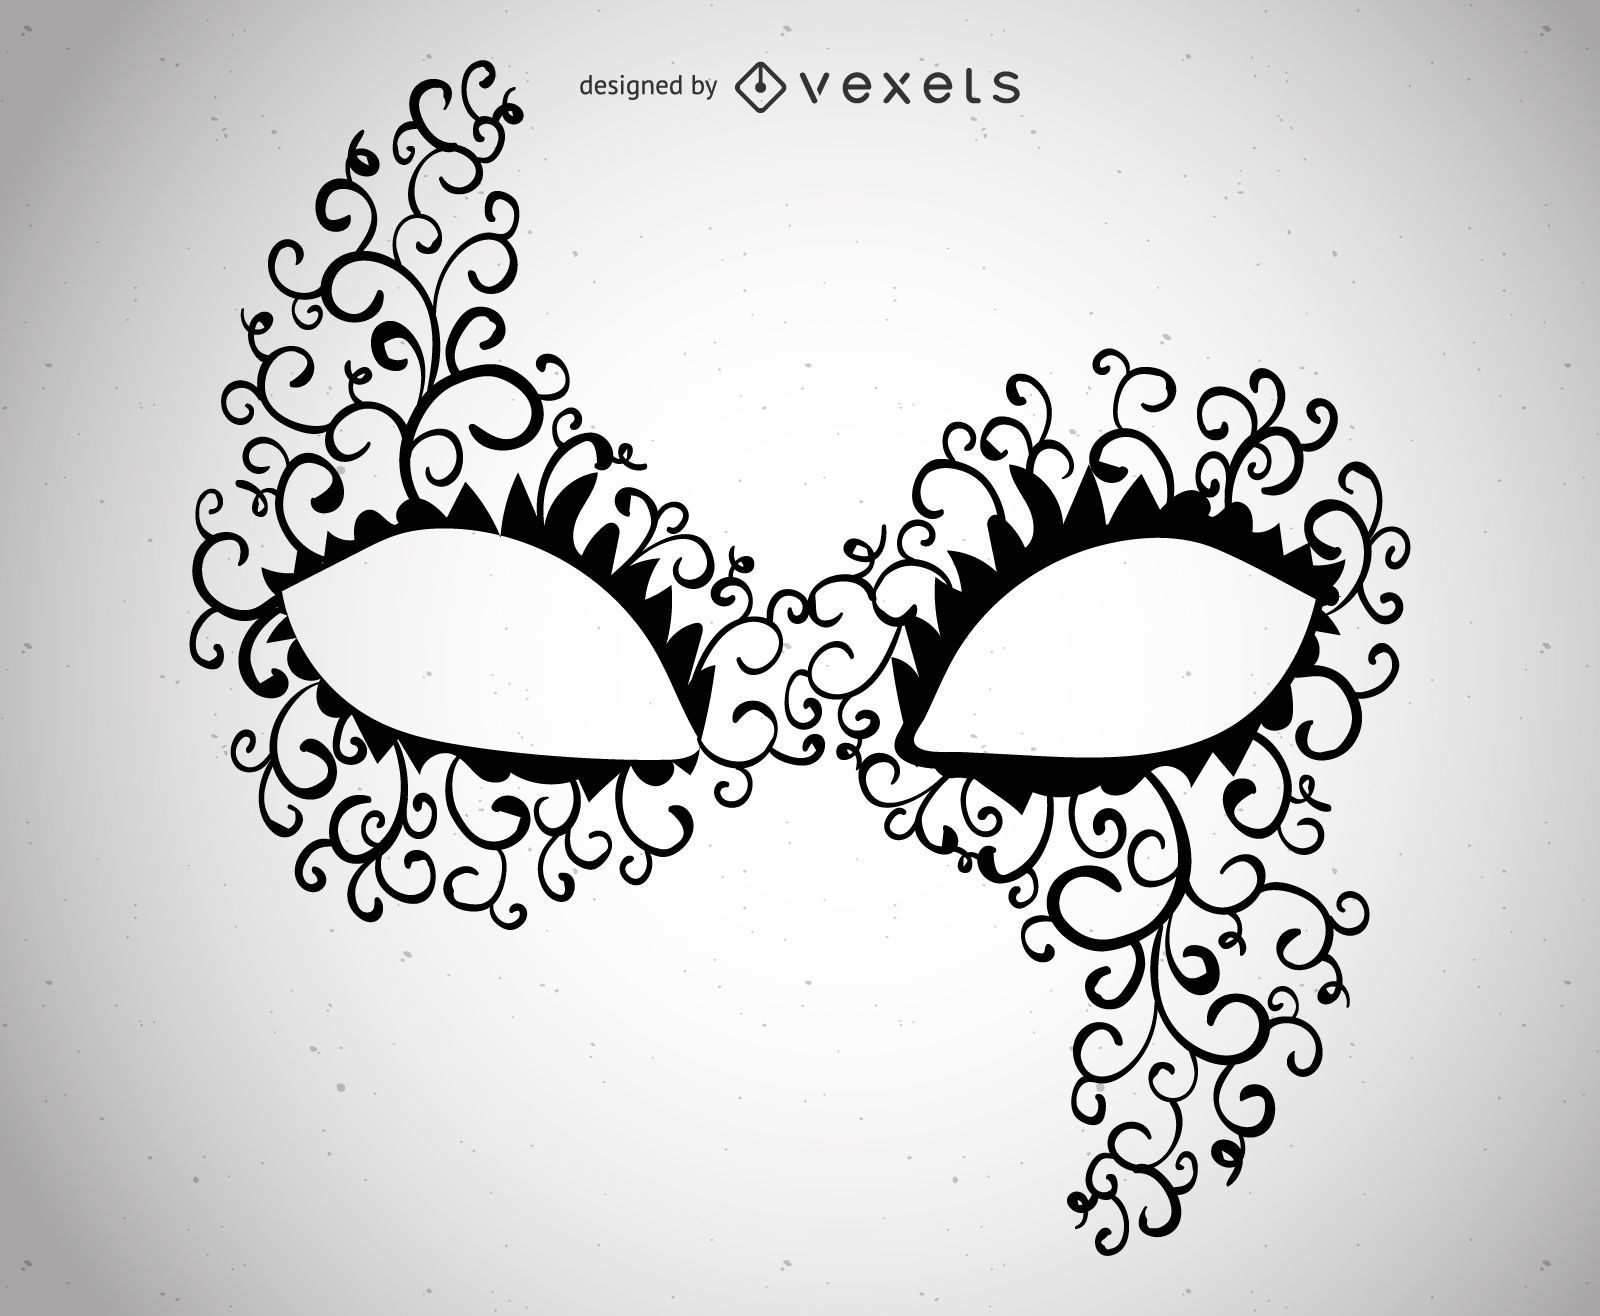 Asymmetric carnival mask illustration